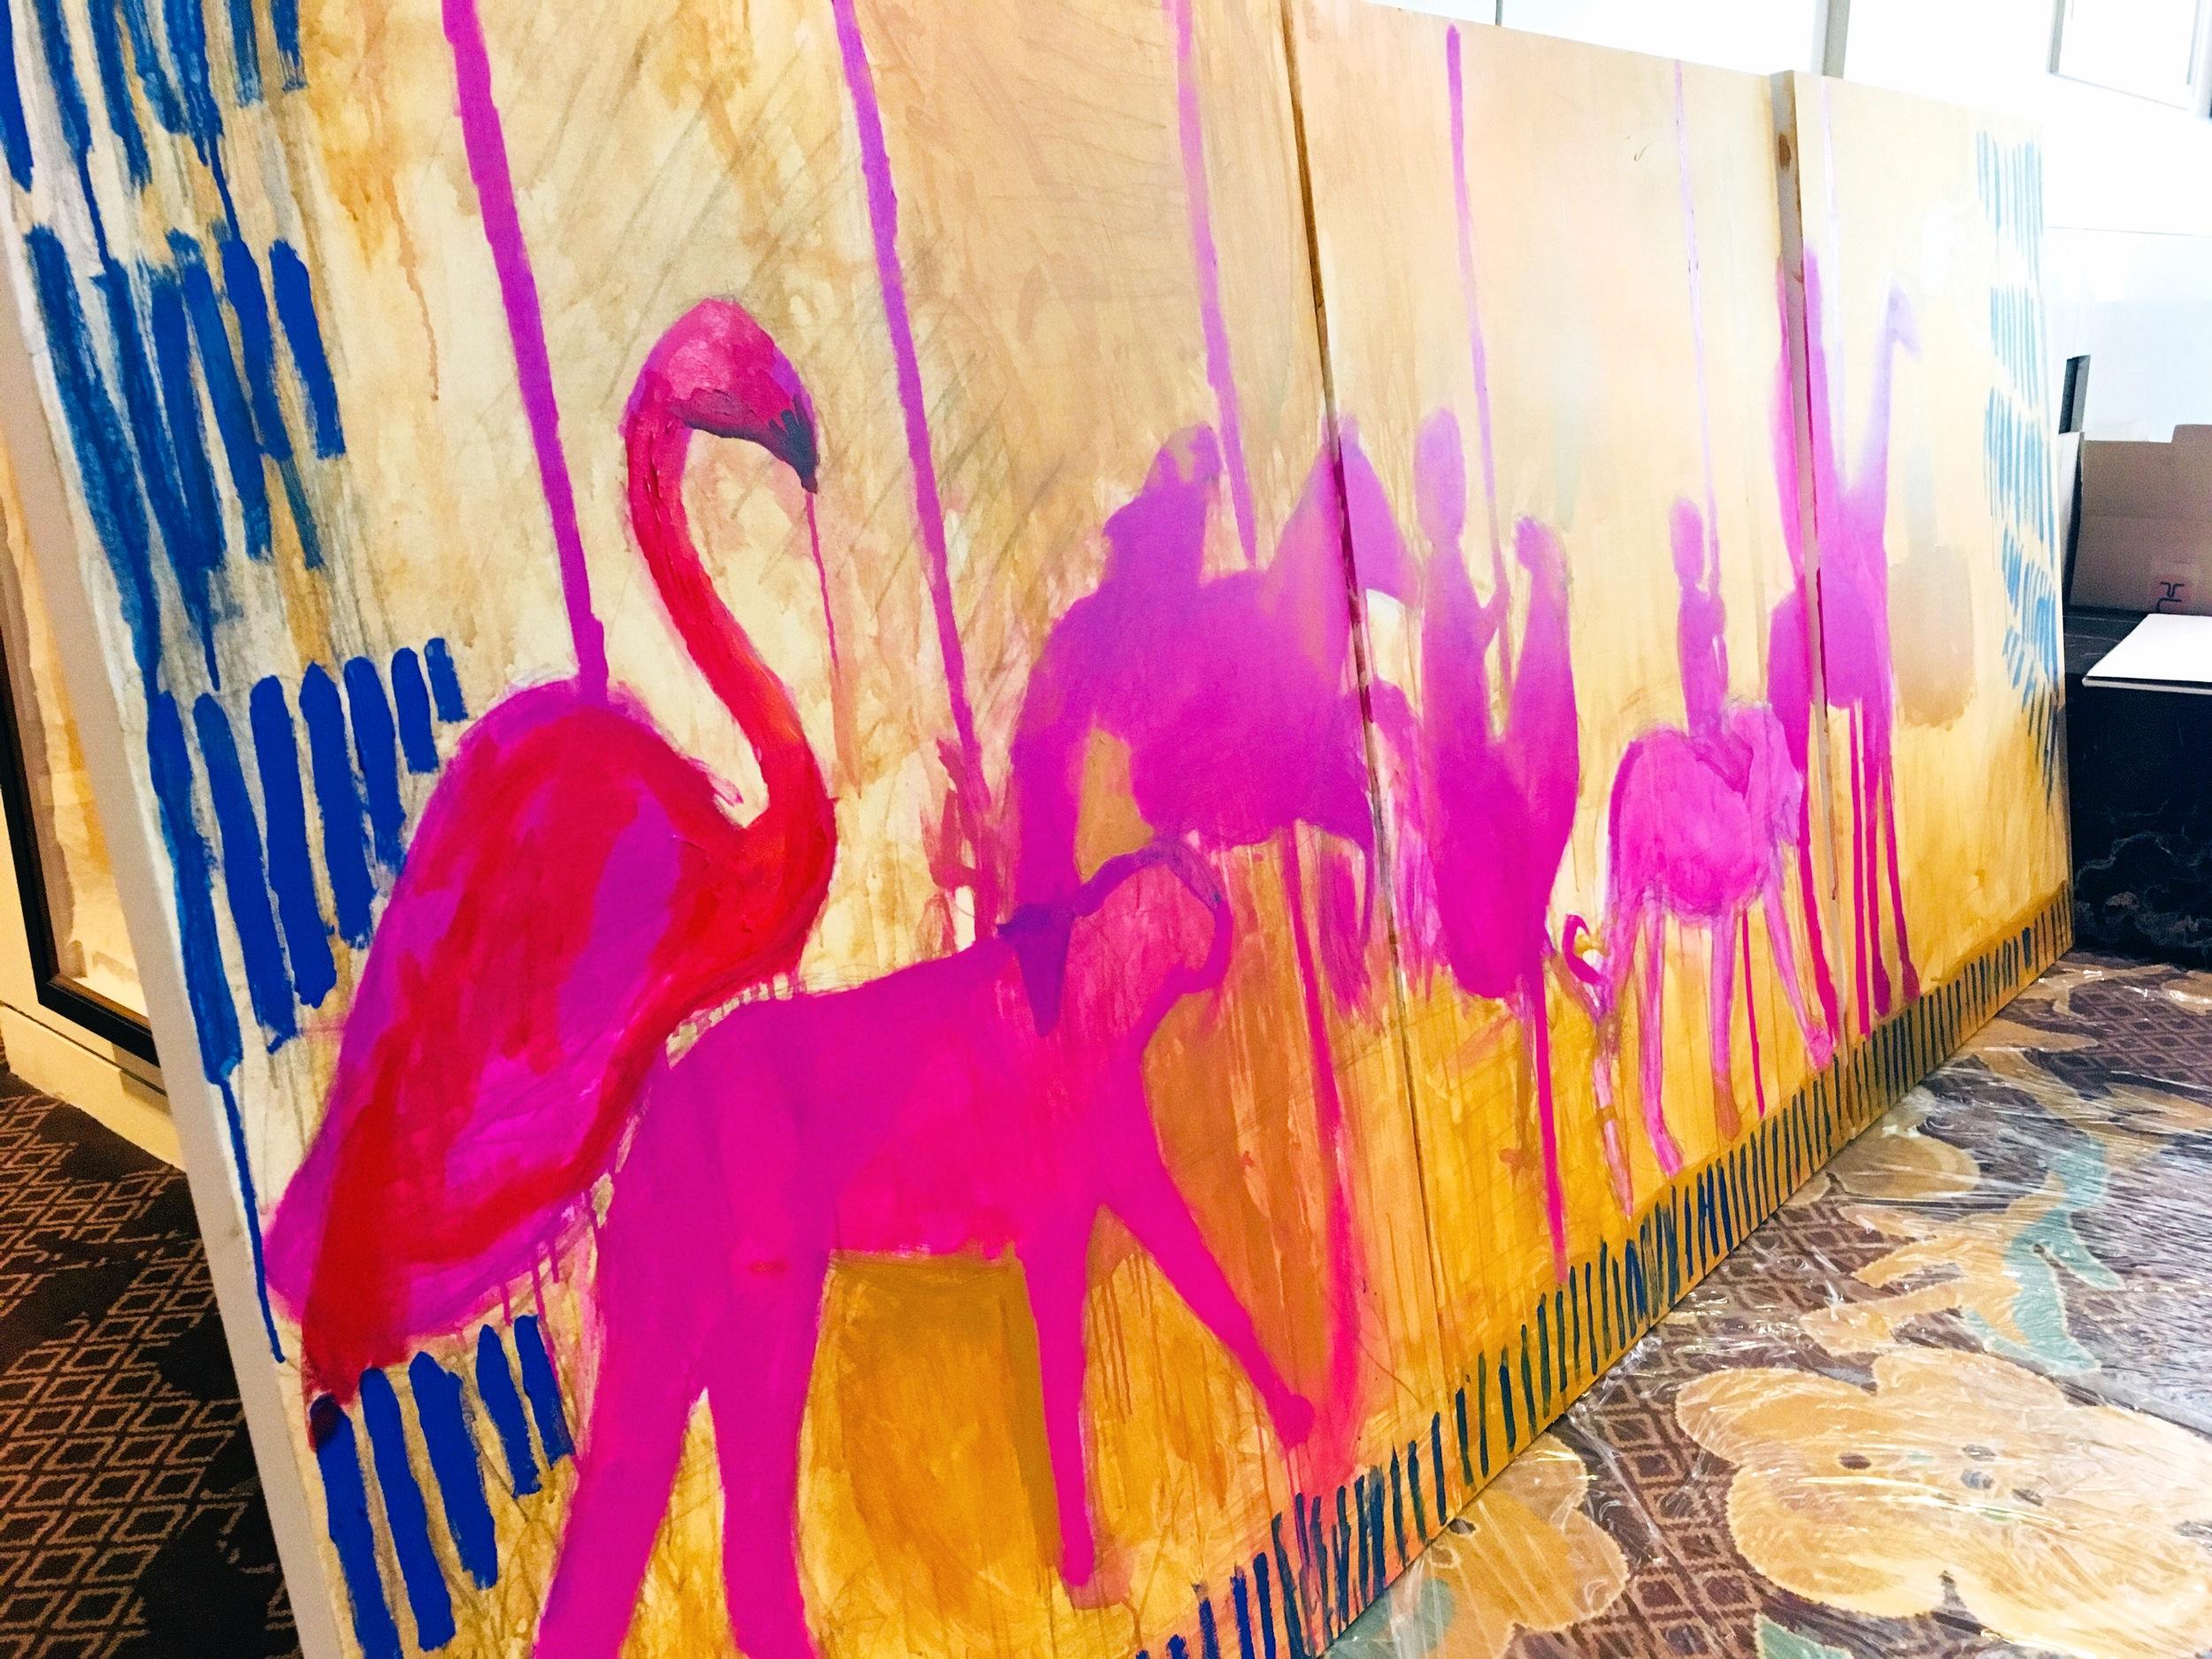 Flamingos-HotelAtPlay.JPG